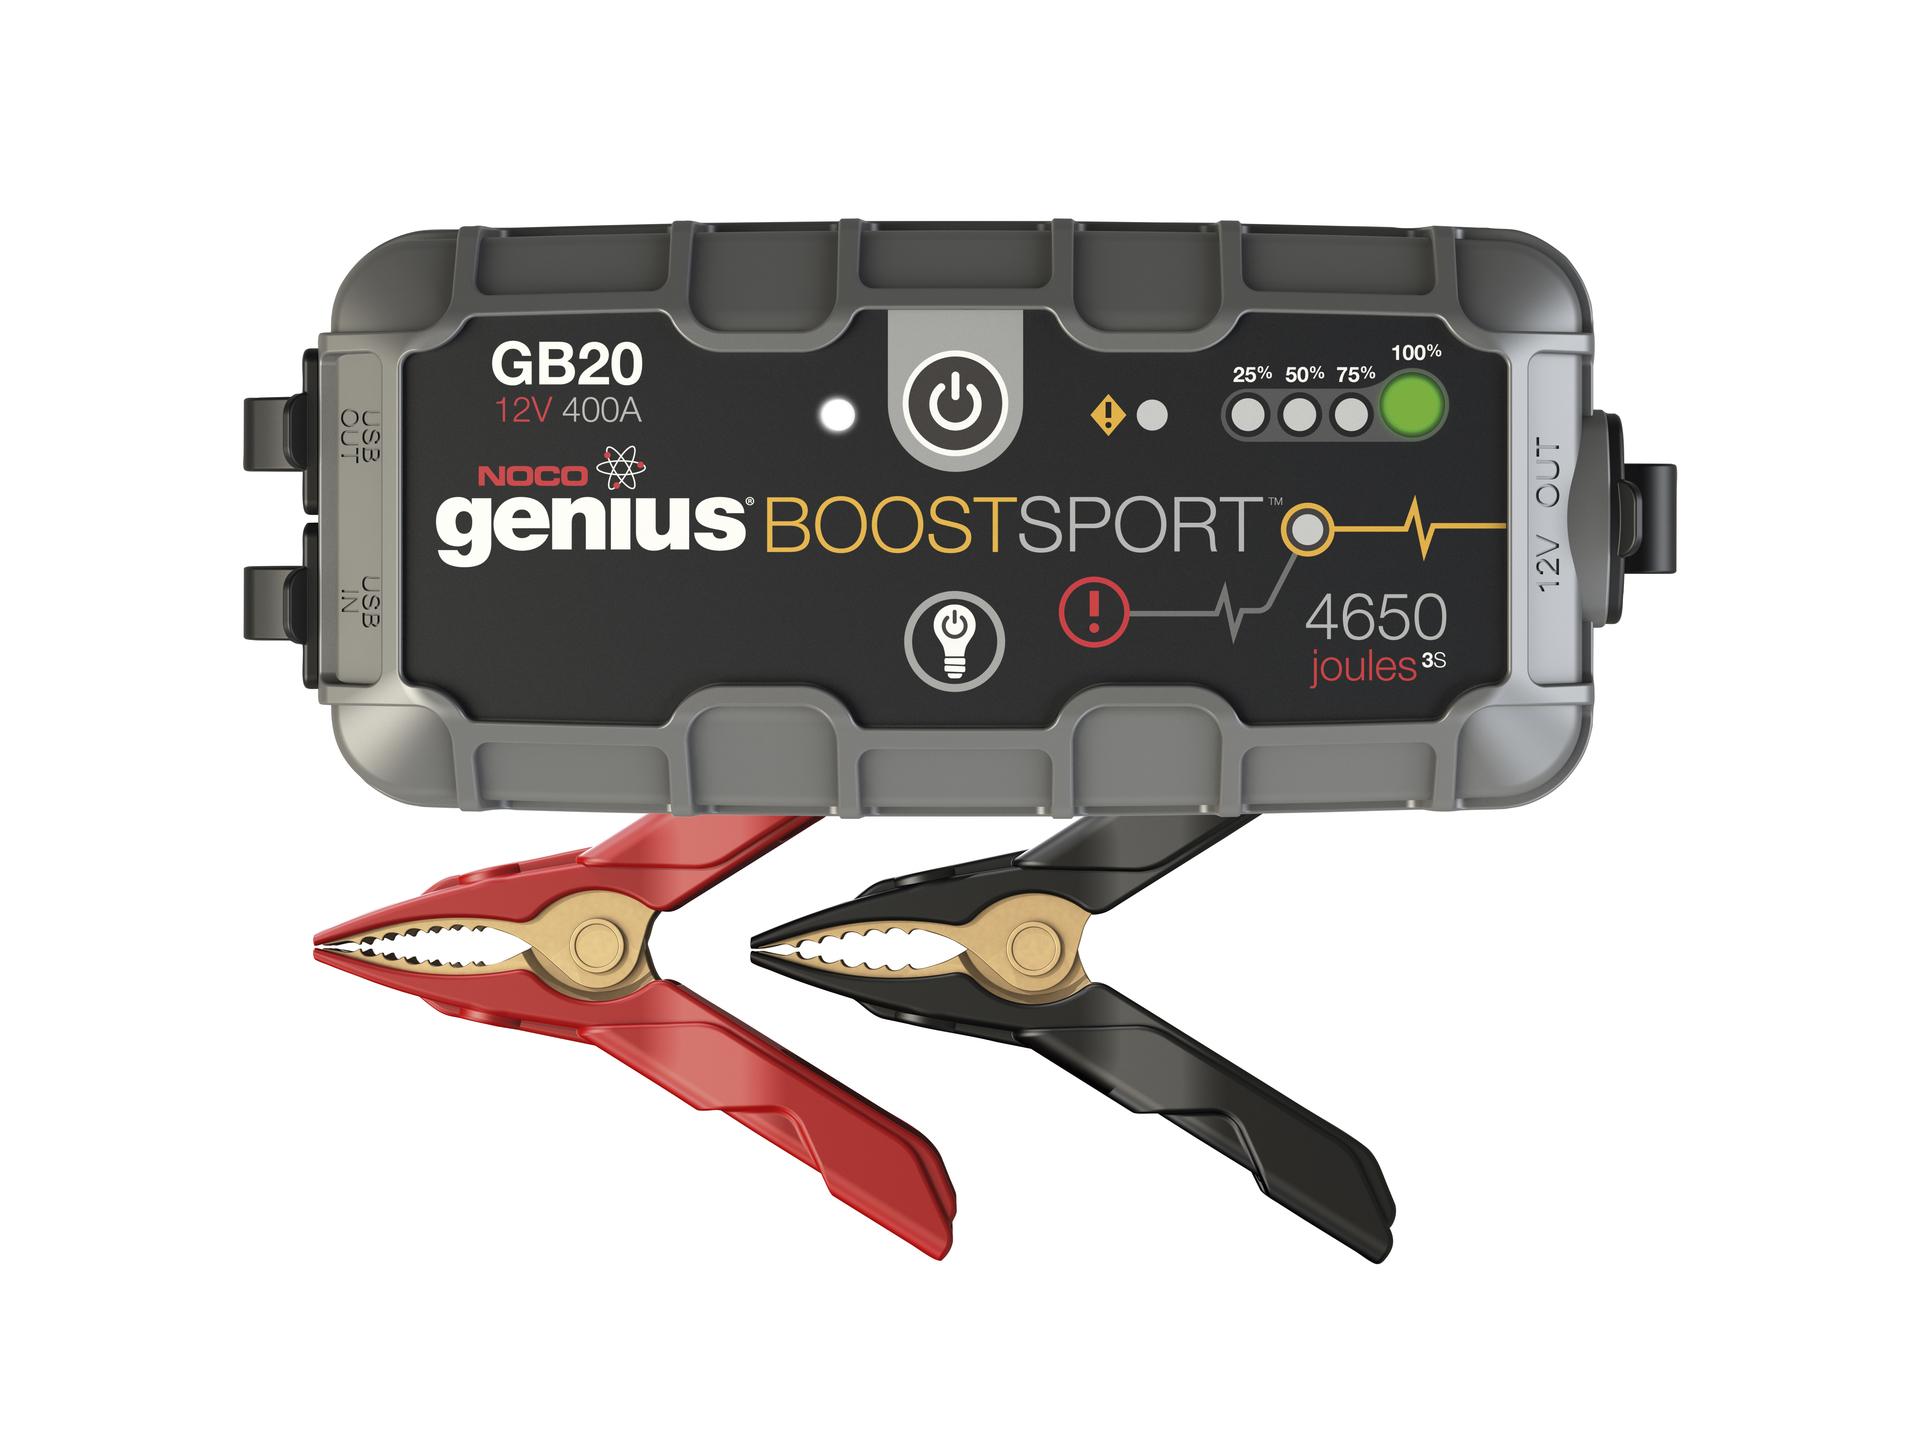 Sport Gb20 Lithium Jumpstarter 400a